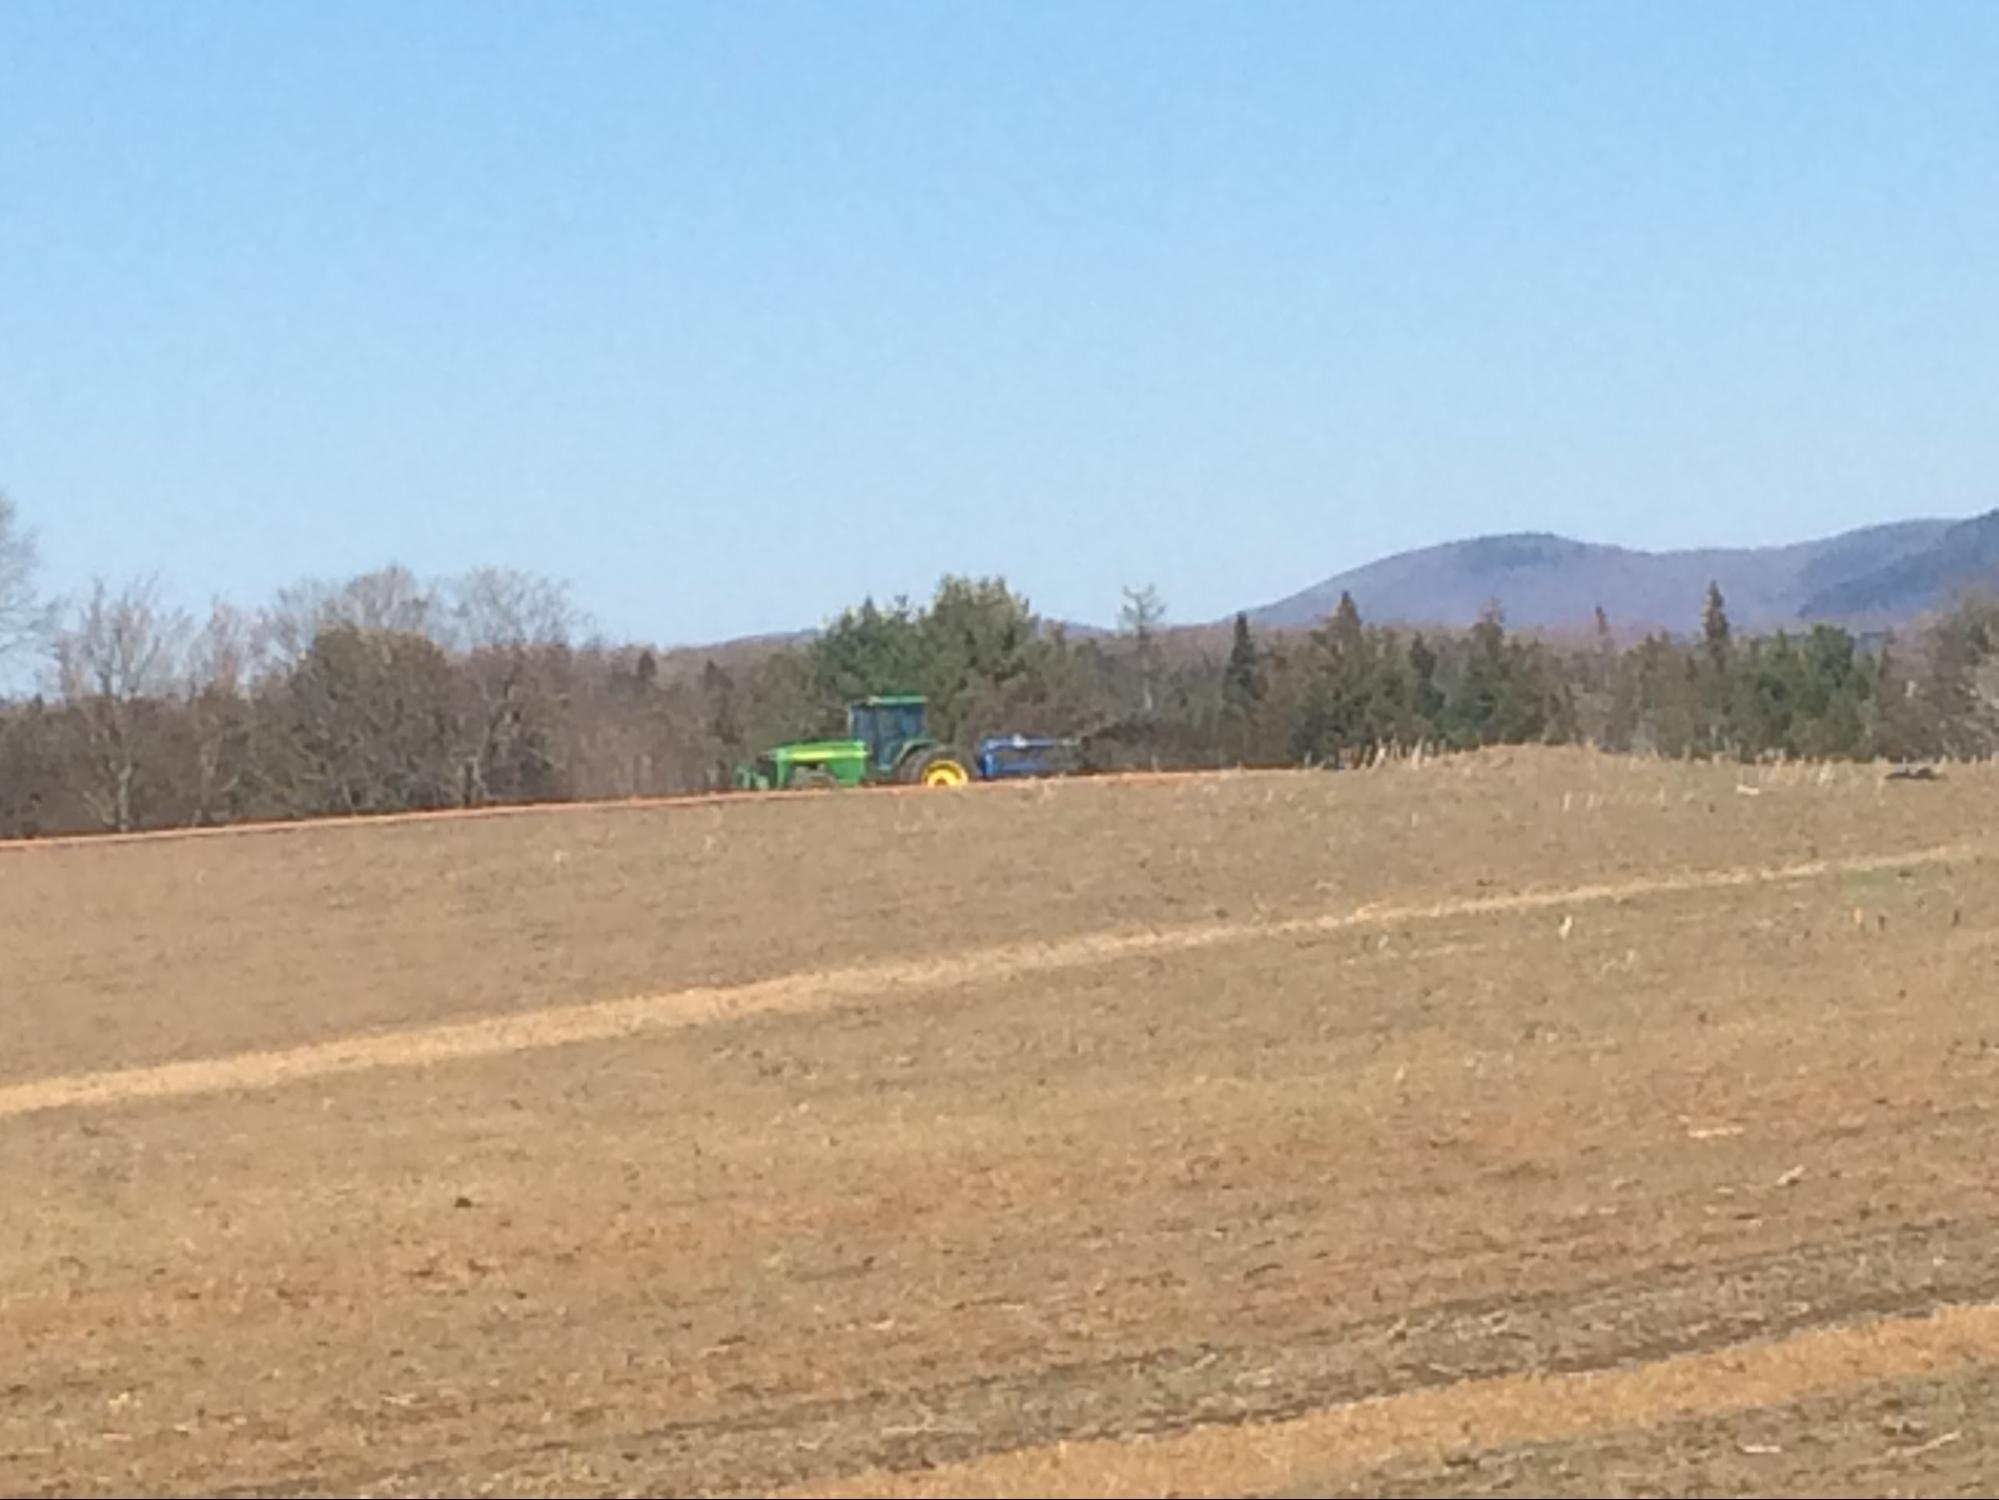 Manure is spread through a dragline system on a corn field